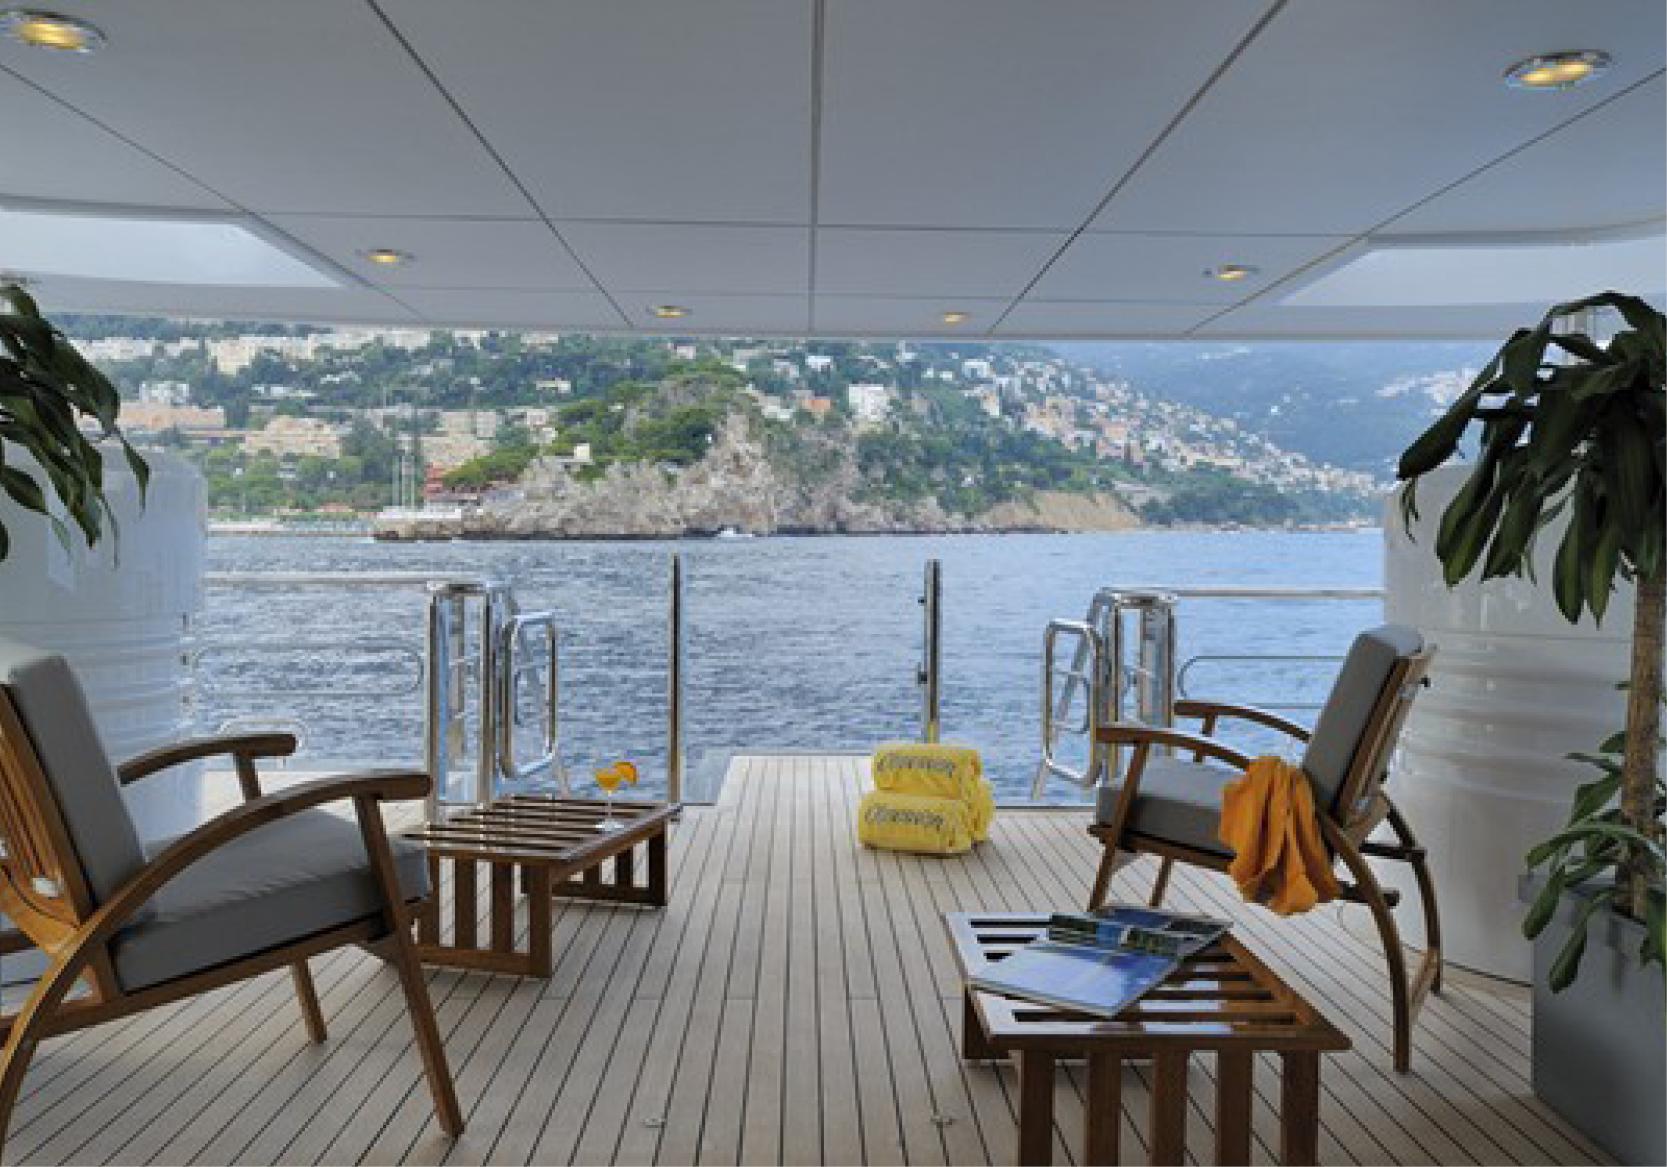 Karen-Lynn-Interior-Design-Yacht-Obsession-10.jpg